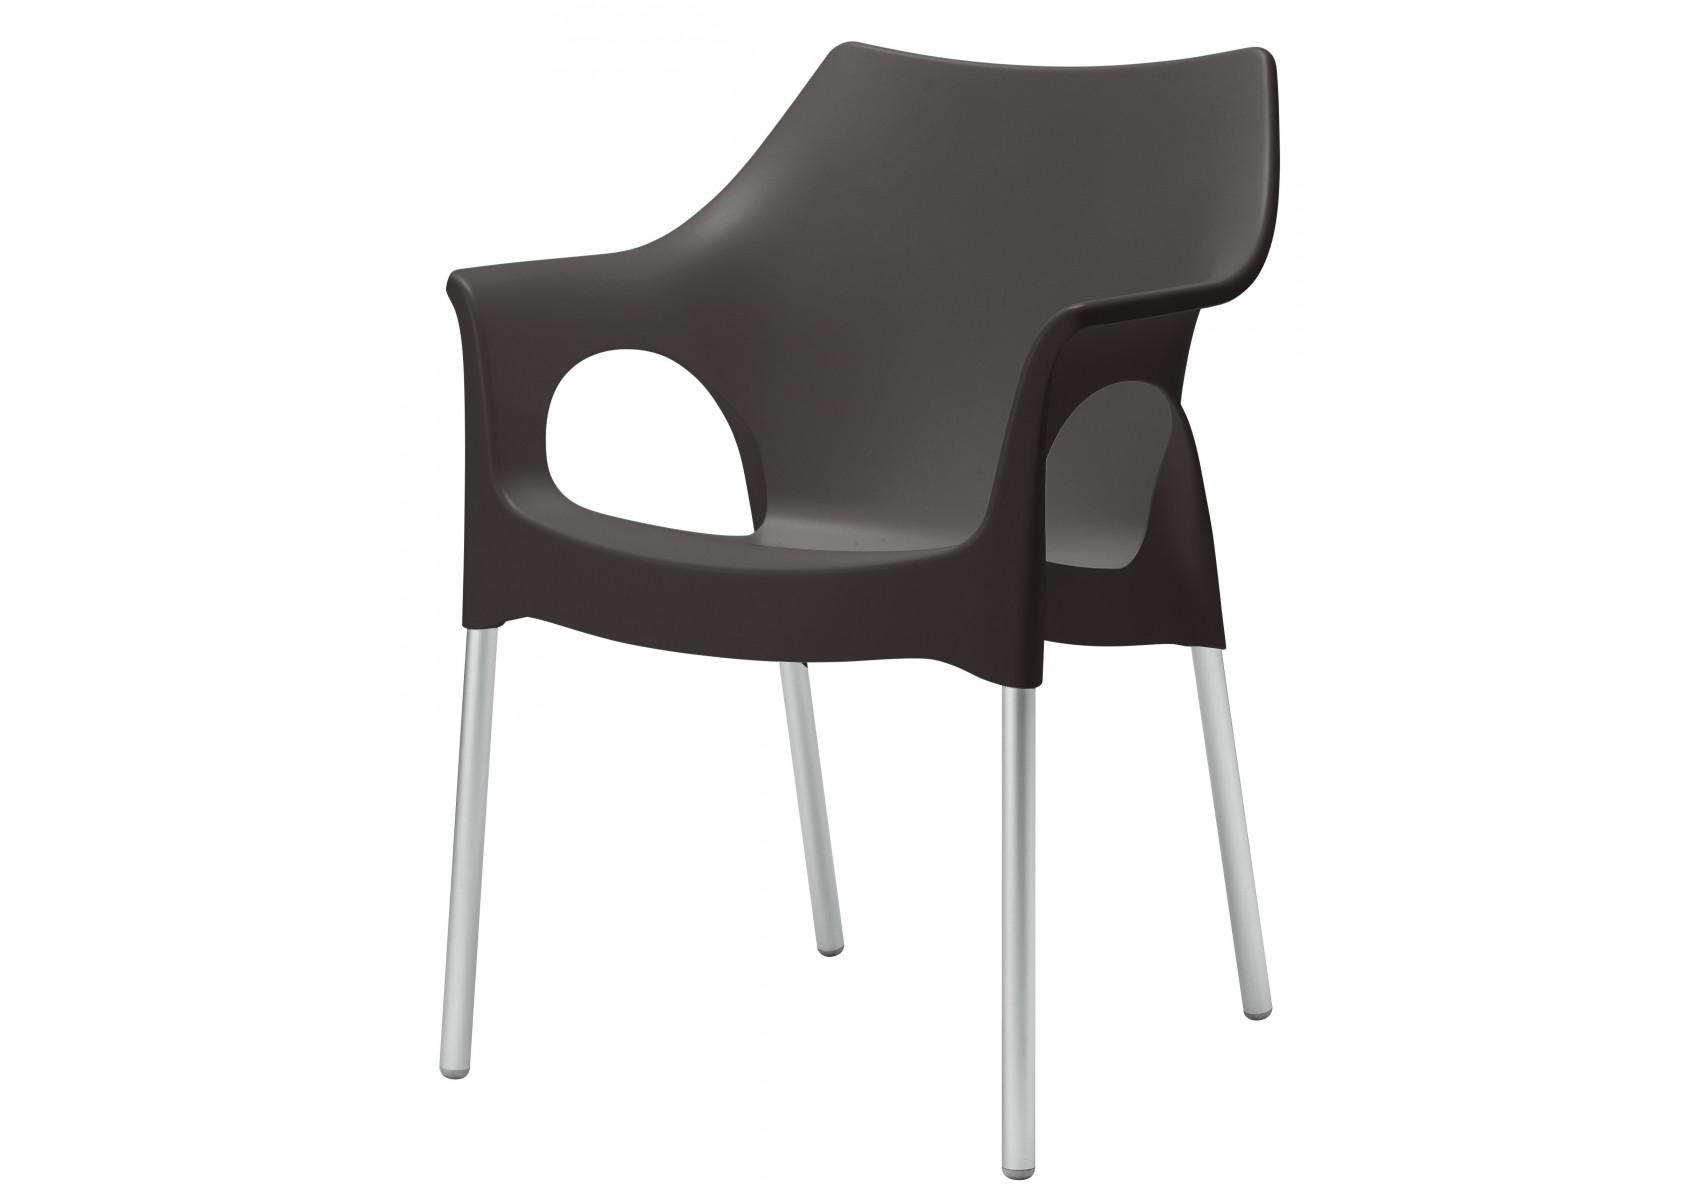 chaises design de jardin ola par scab design. Black Bedroom Furniture Sets. Home Design Ideas